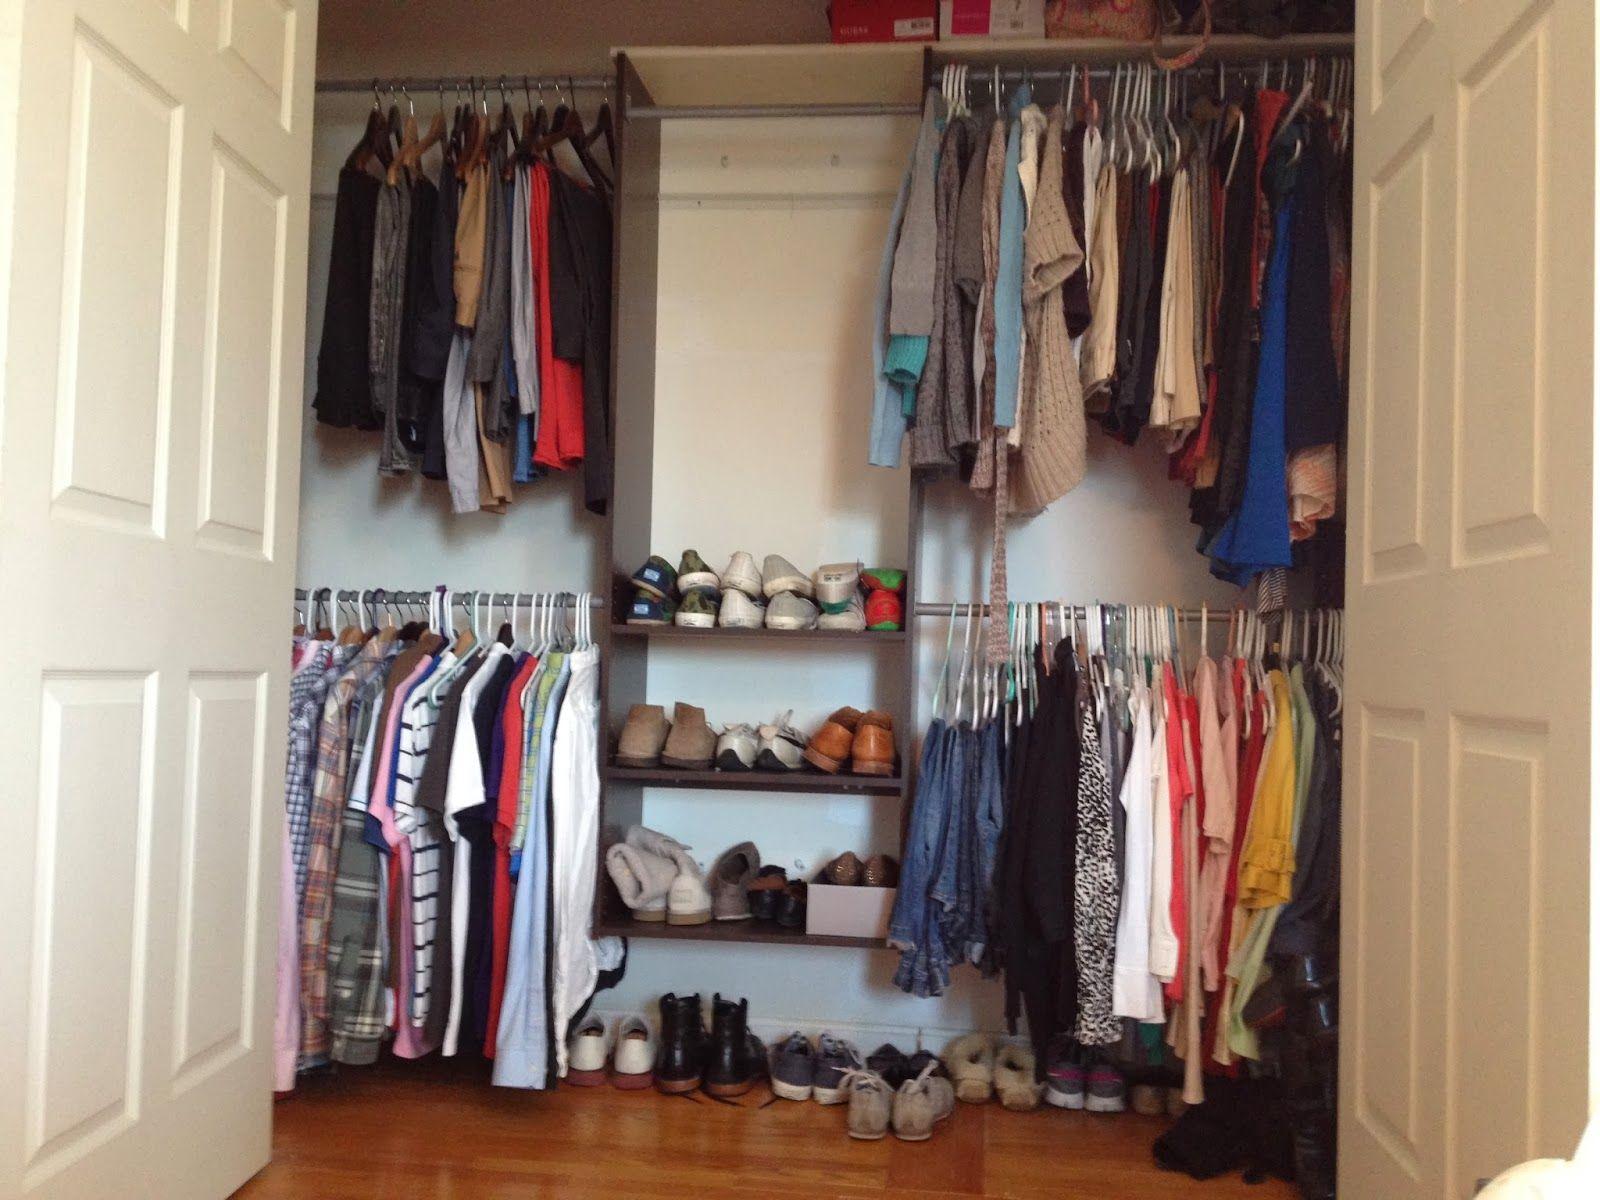 Organizing small closet space closet organization system the organizing small closet space closet organization system the space is put to solutioingenieria Images